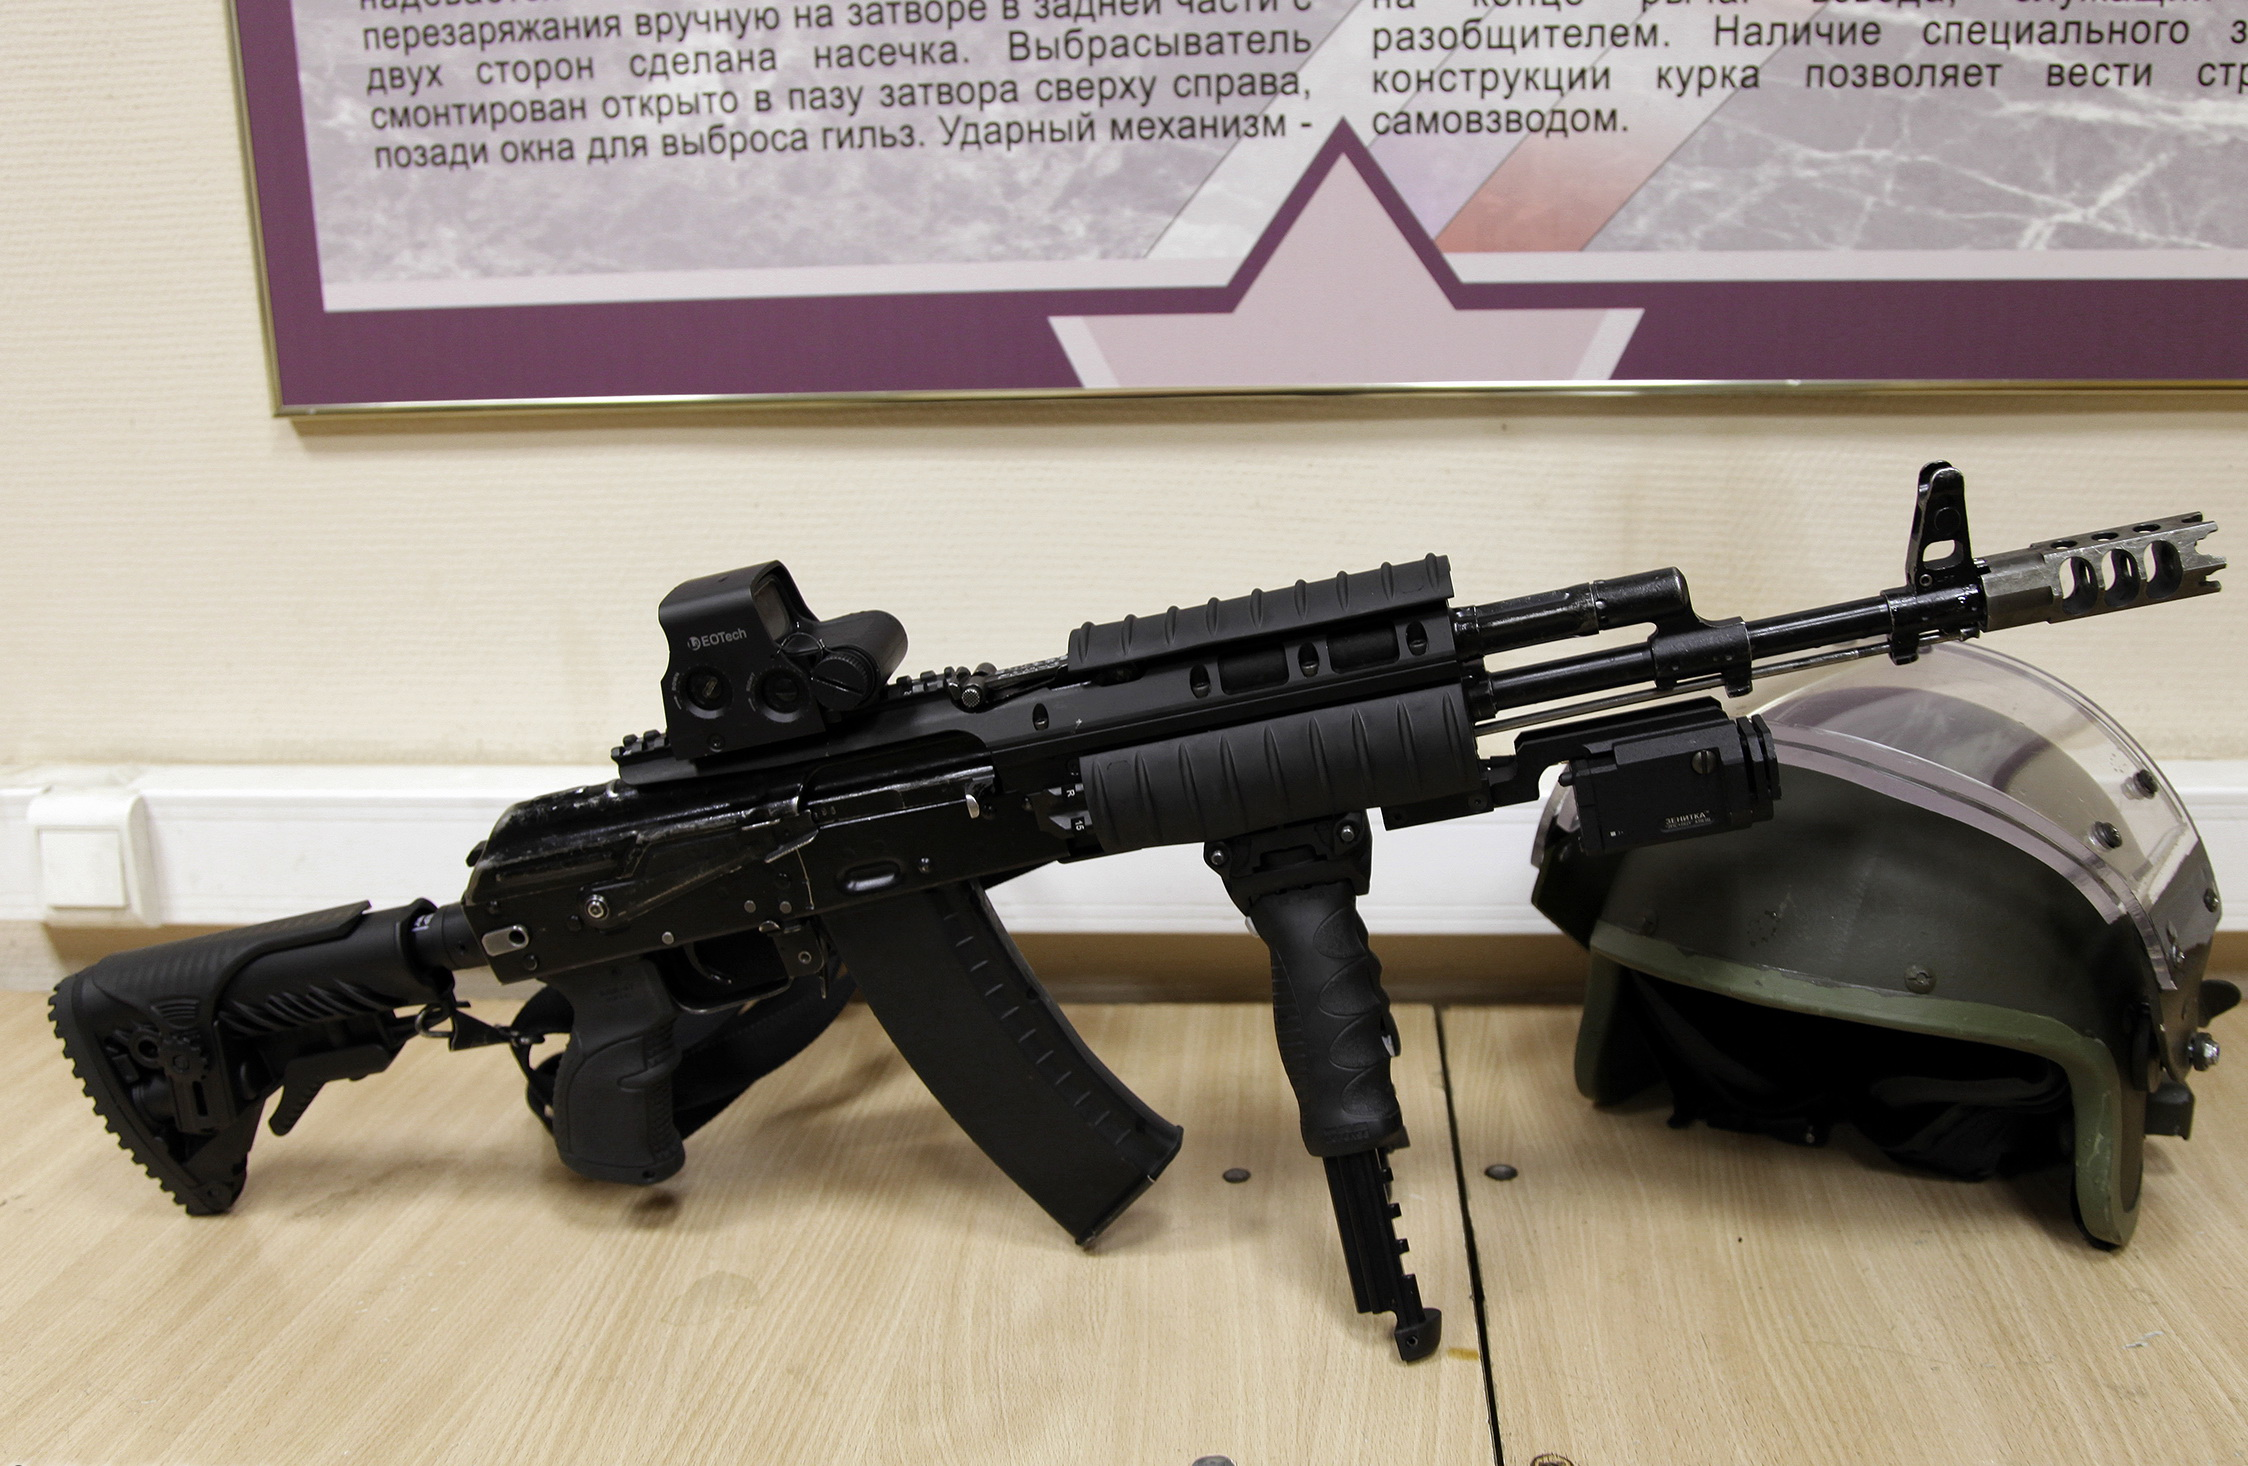 Ak74m: File:AK74M FAB Defense Tuning (3).jpg